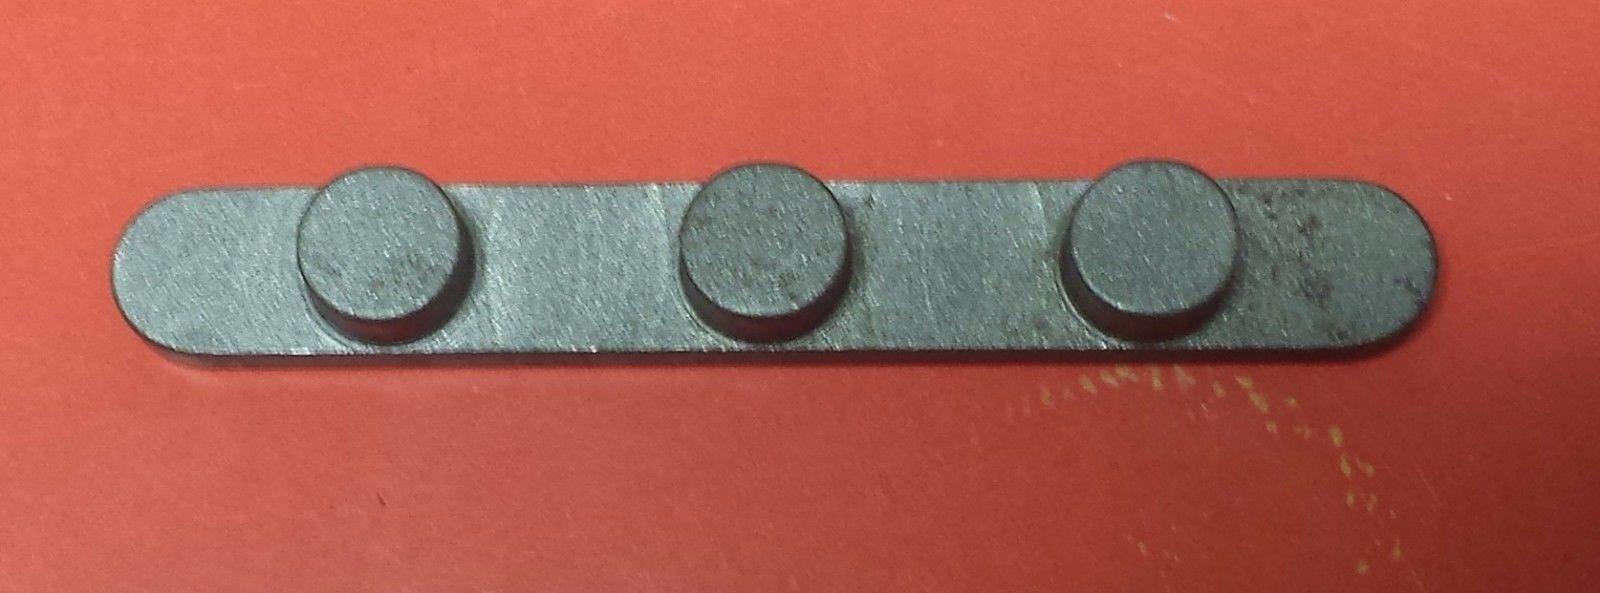 KEYWAY 3 PEG 8 x 60 x 17mm CENTERS KZ